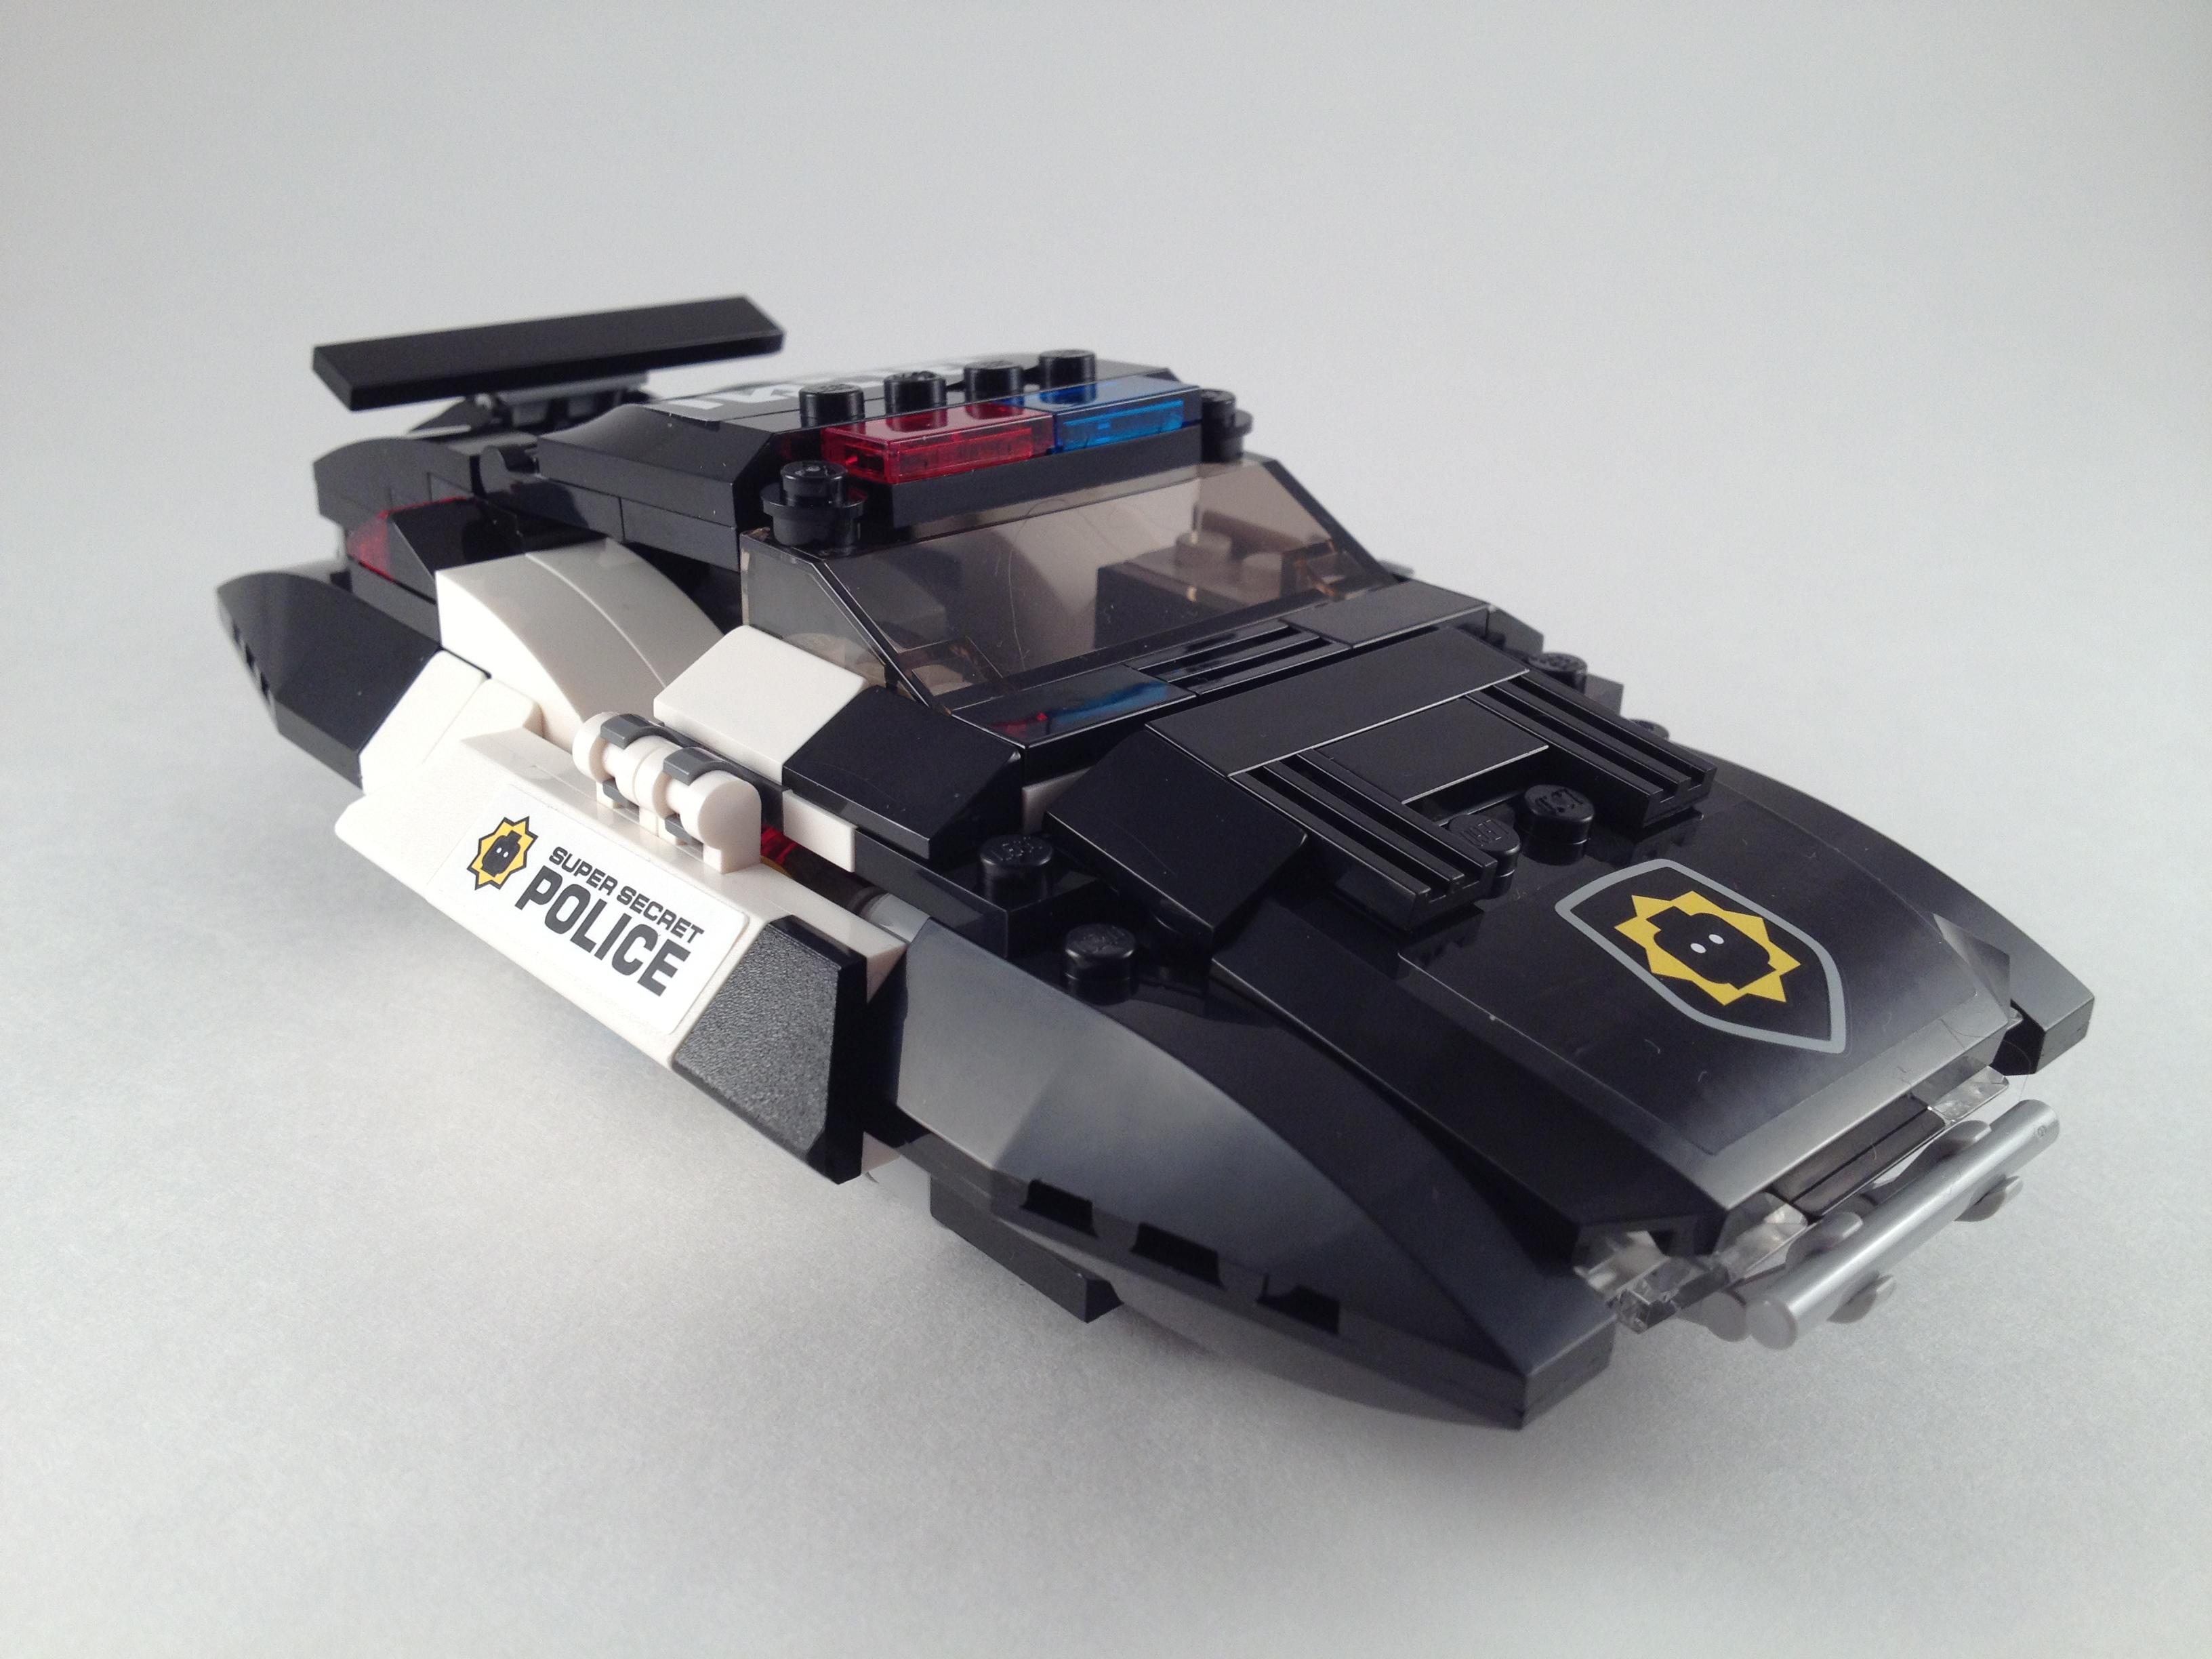 LEGO The LEGO Movie Bad Cop Pursuit (70802) | Brick Radar